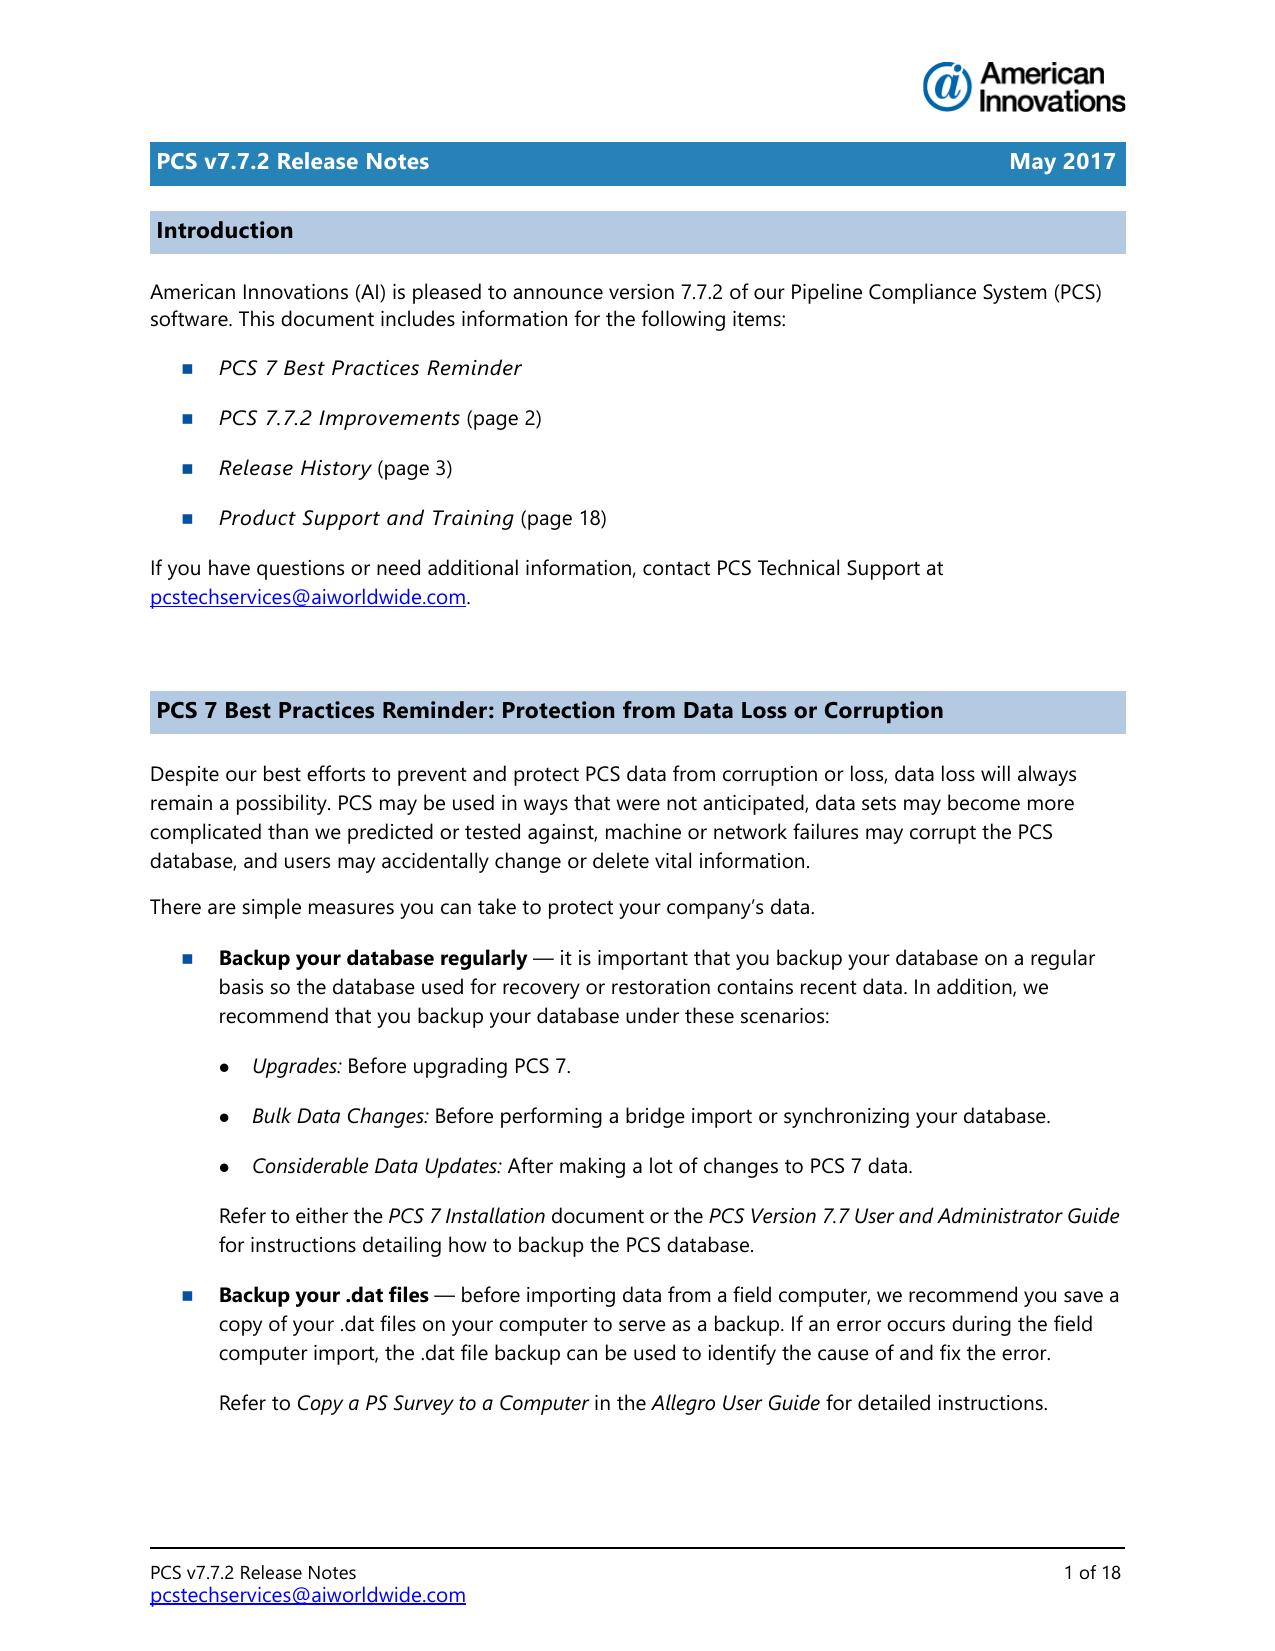 PCS 7 Release Notes - American Innovations | manualzz com